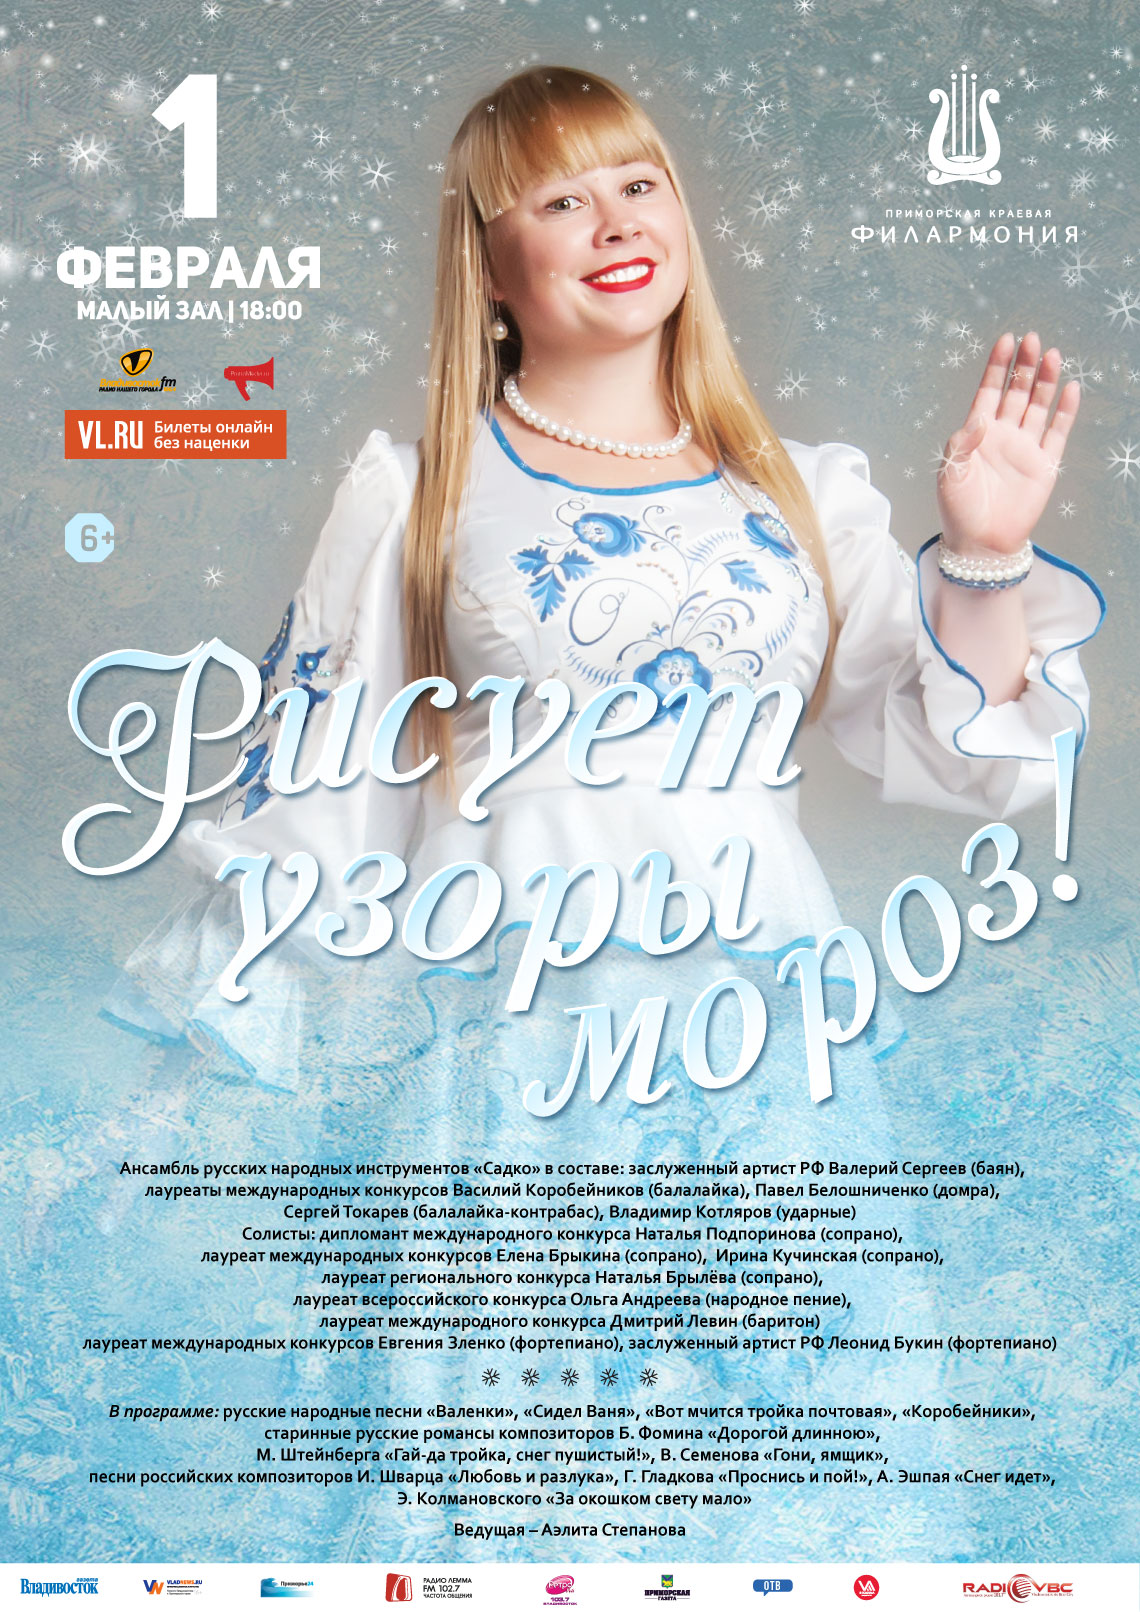 1 февраля Концертная программа «Рисует узоры мороз!»